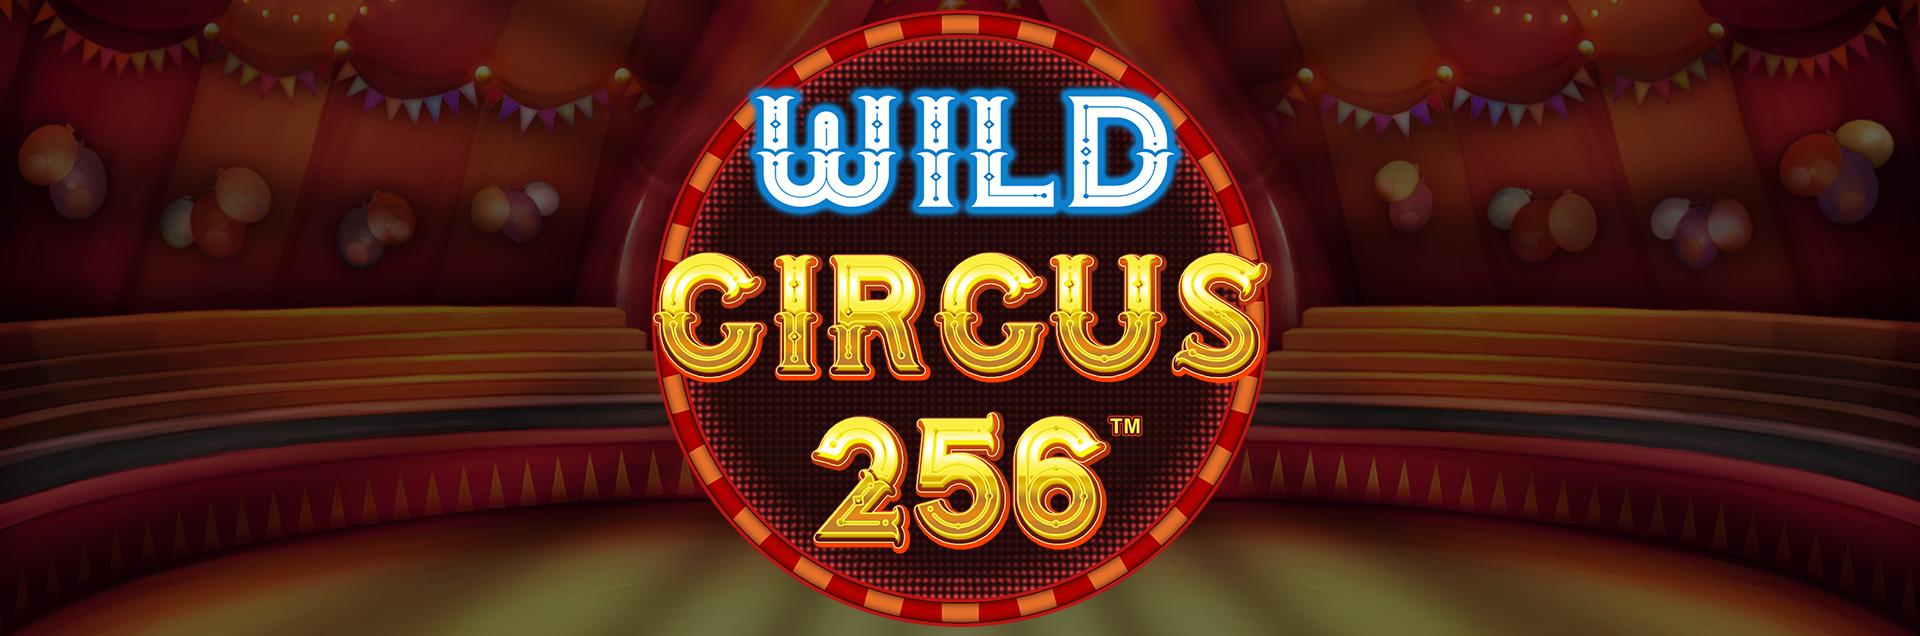 Wild Circus 256 header games